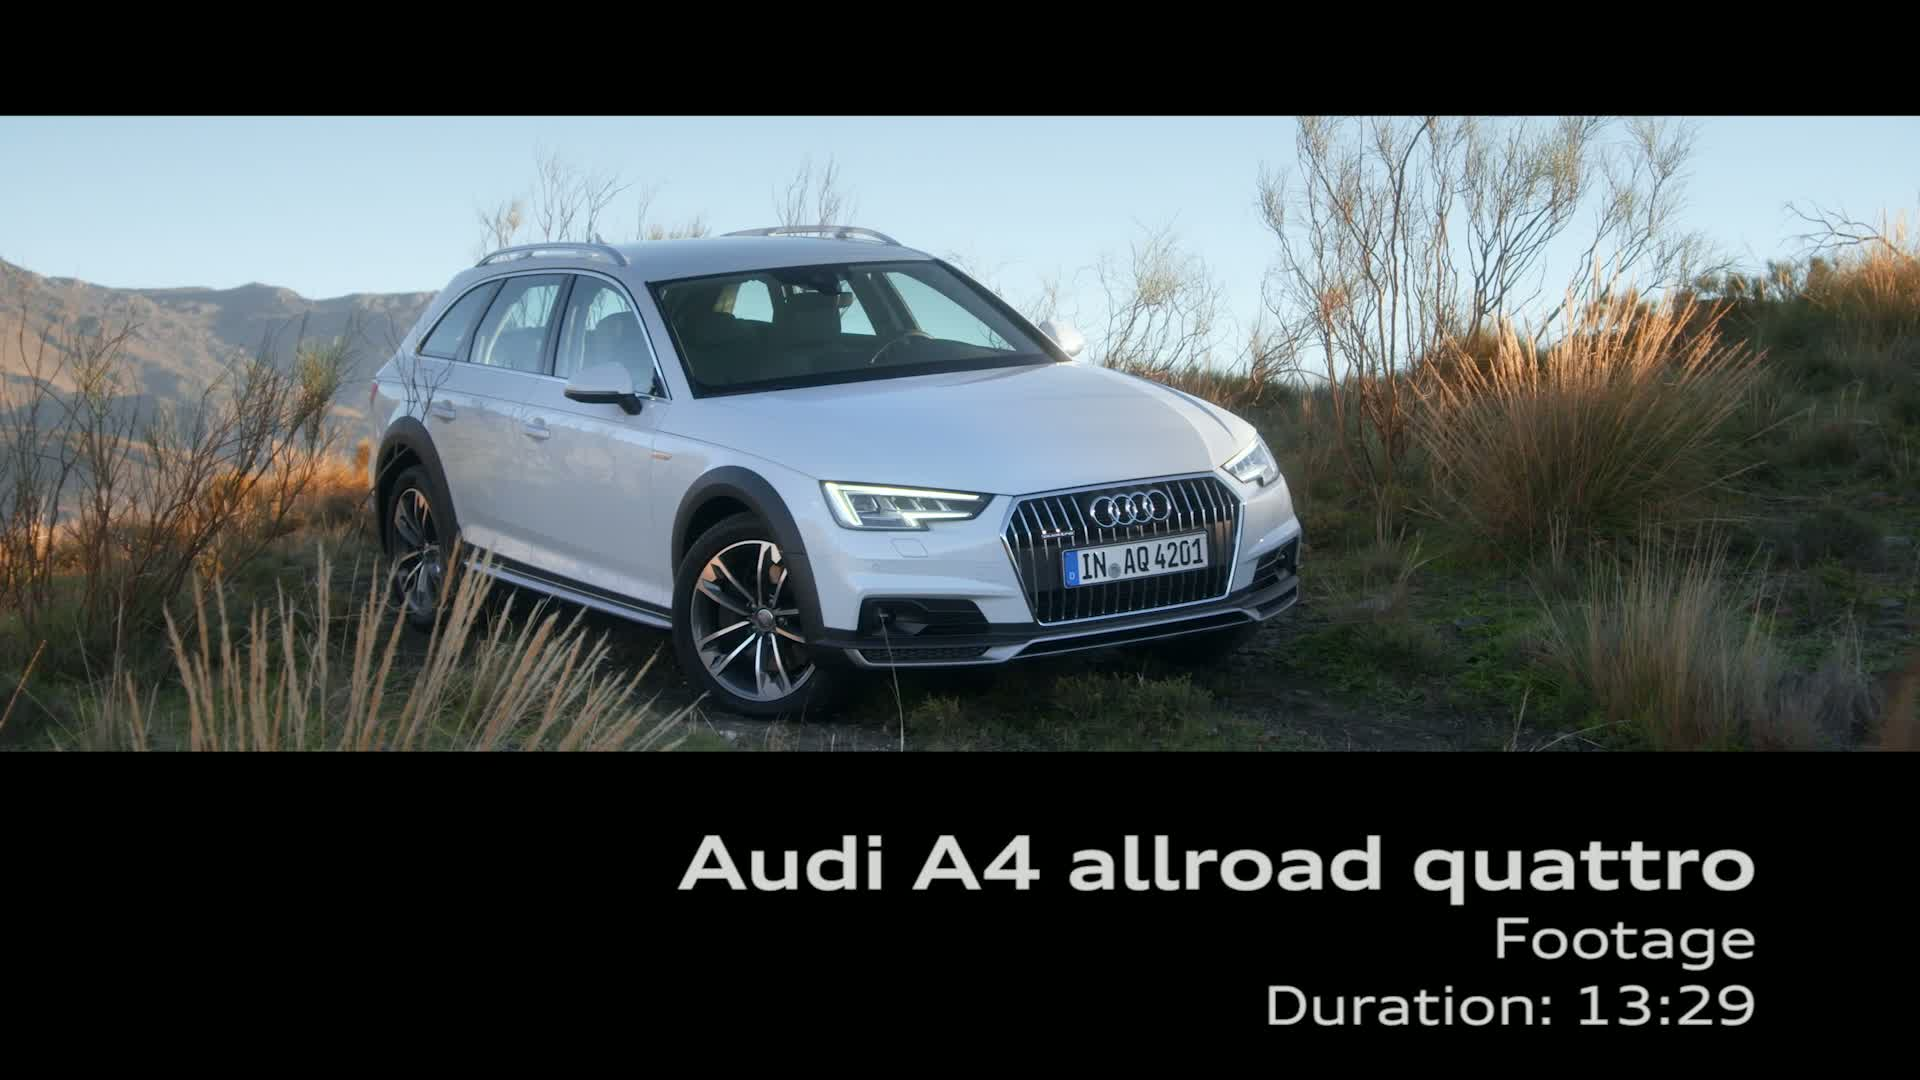 A4 allroad quattro - Footage